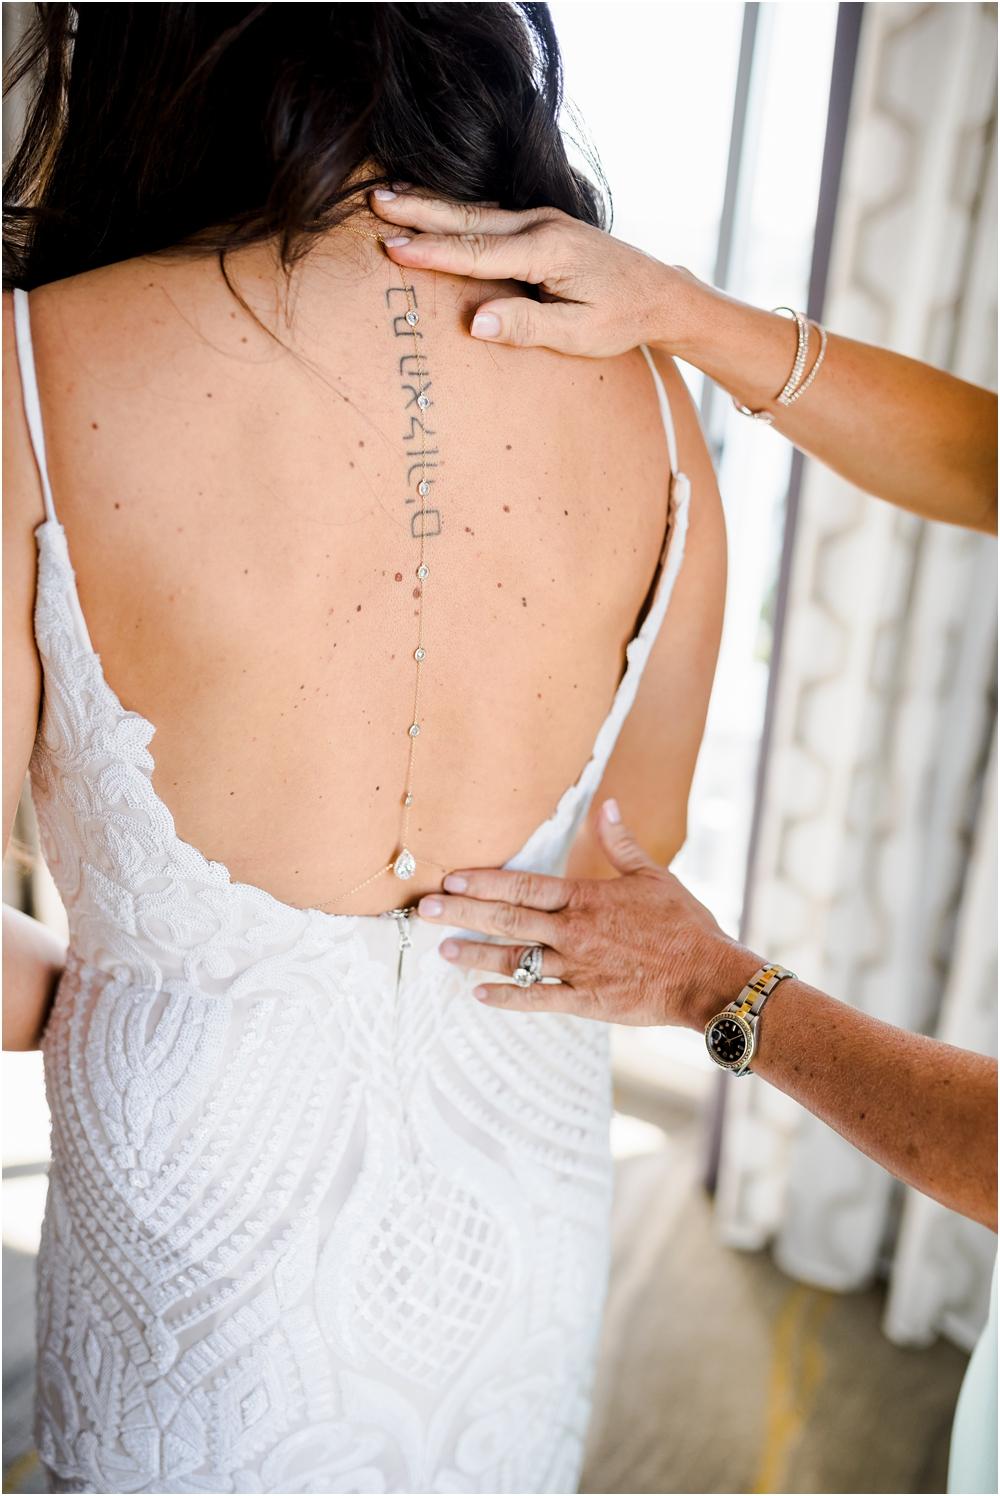 amack-wedding-kiersten-stevenson-photography-30a-panama-city-beach-dothan-tallahassee-(112-of-882).JPG